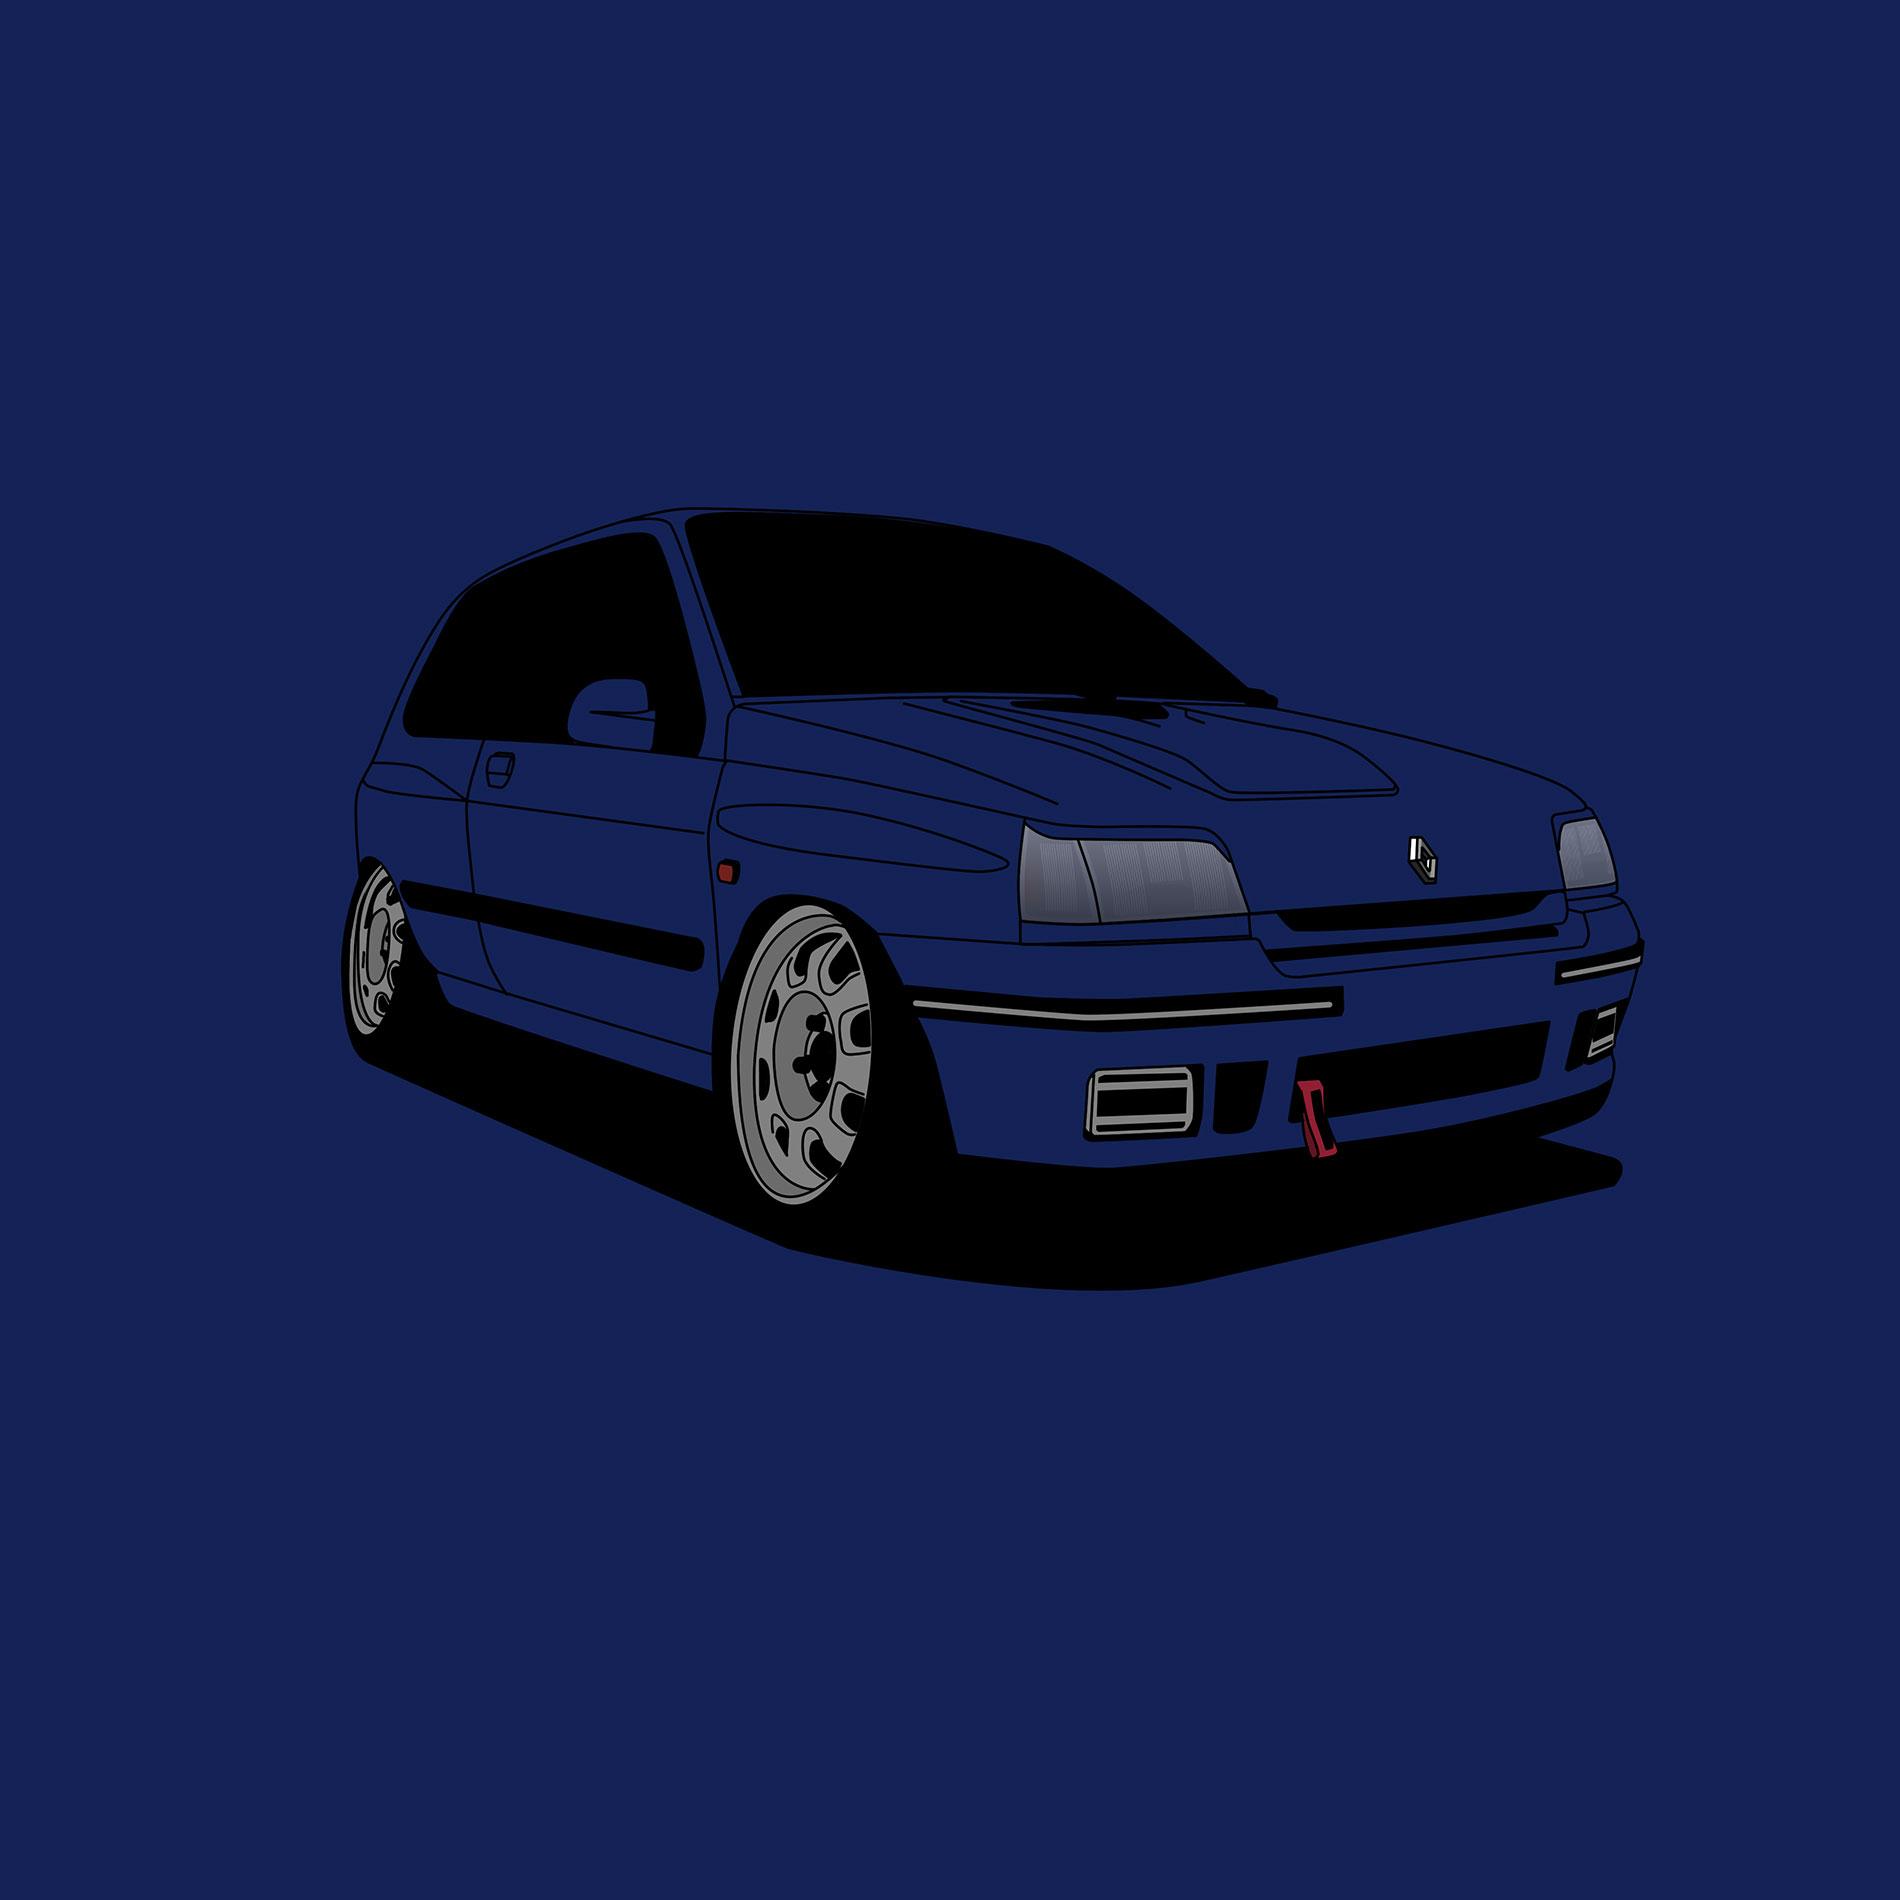 Renault Clio 1 16V - Cartoon by vtstegofo